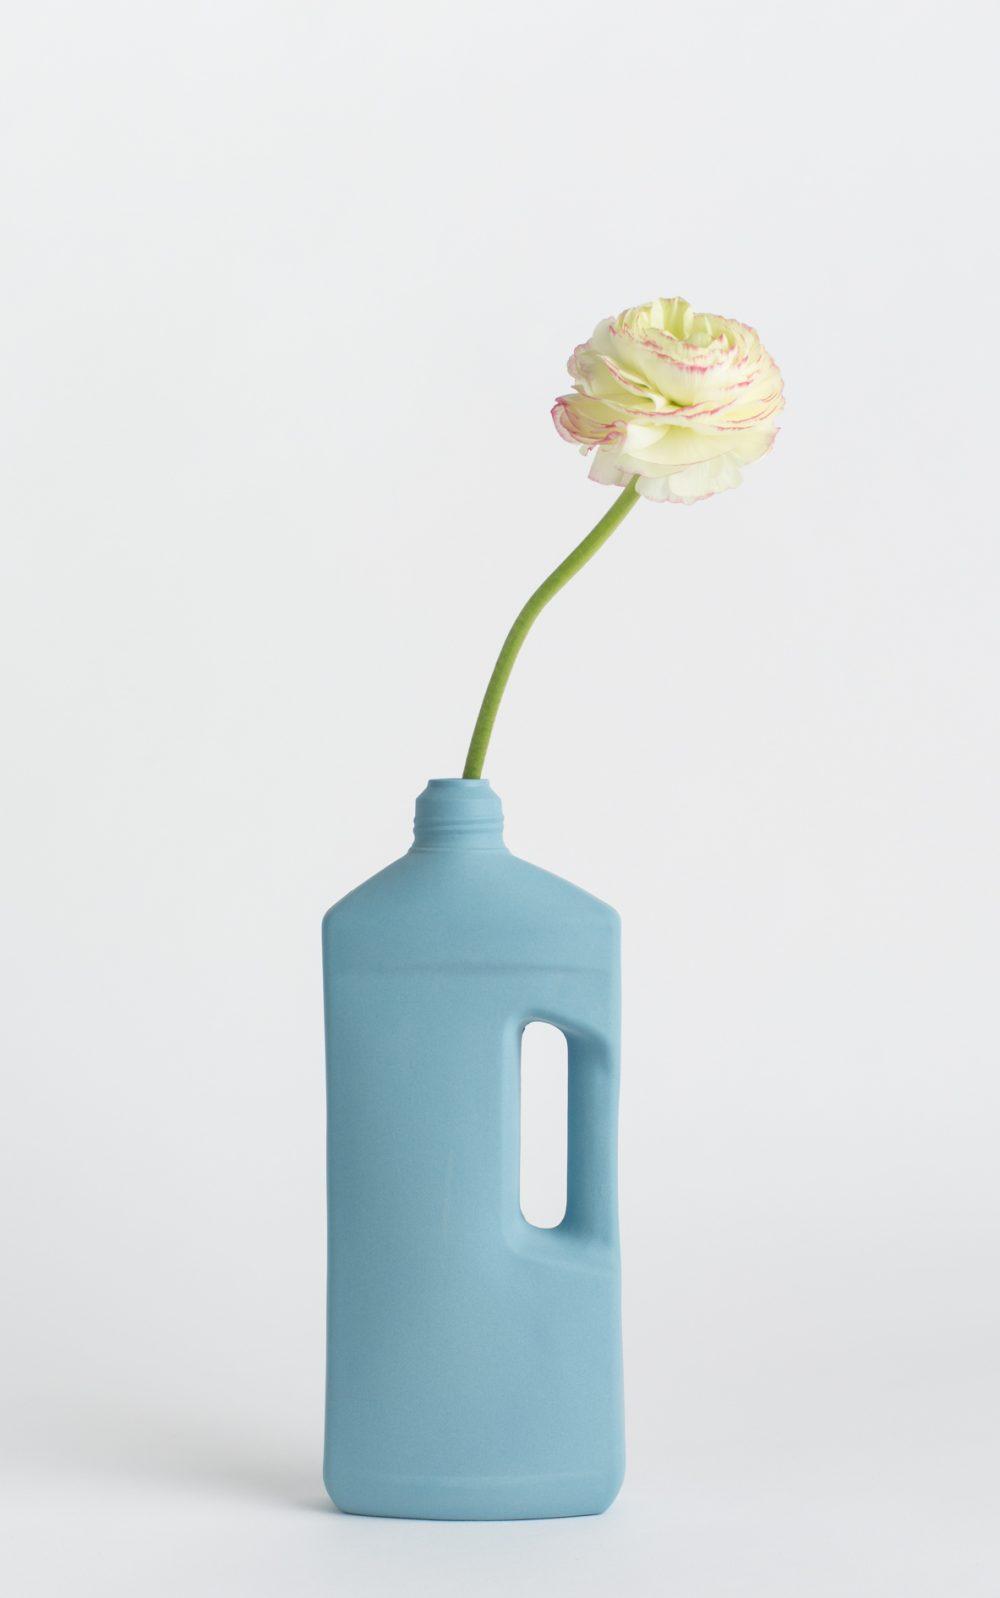 bottle vase #3 dark blue with flower